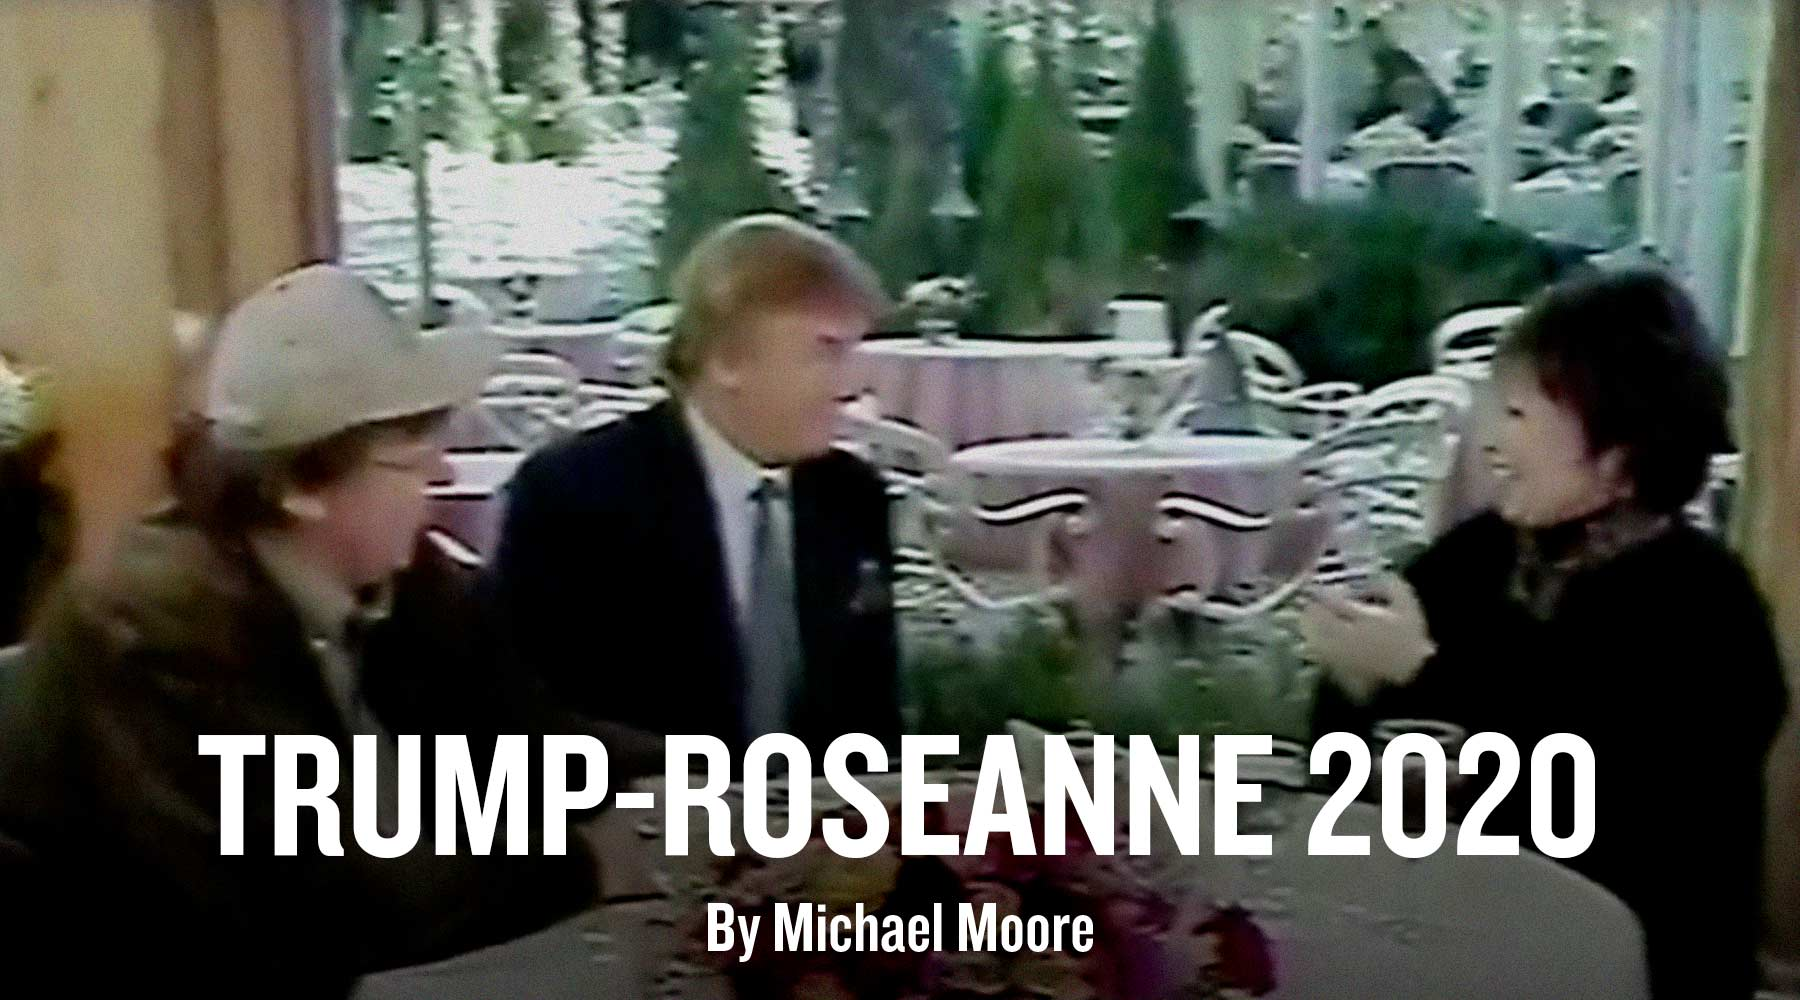 New Roseanne Show 2020.Trump Roseanne 2020 Michael Moore